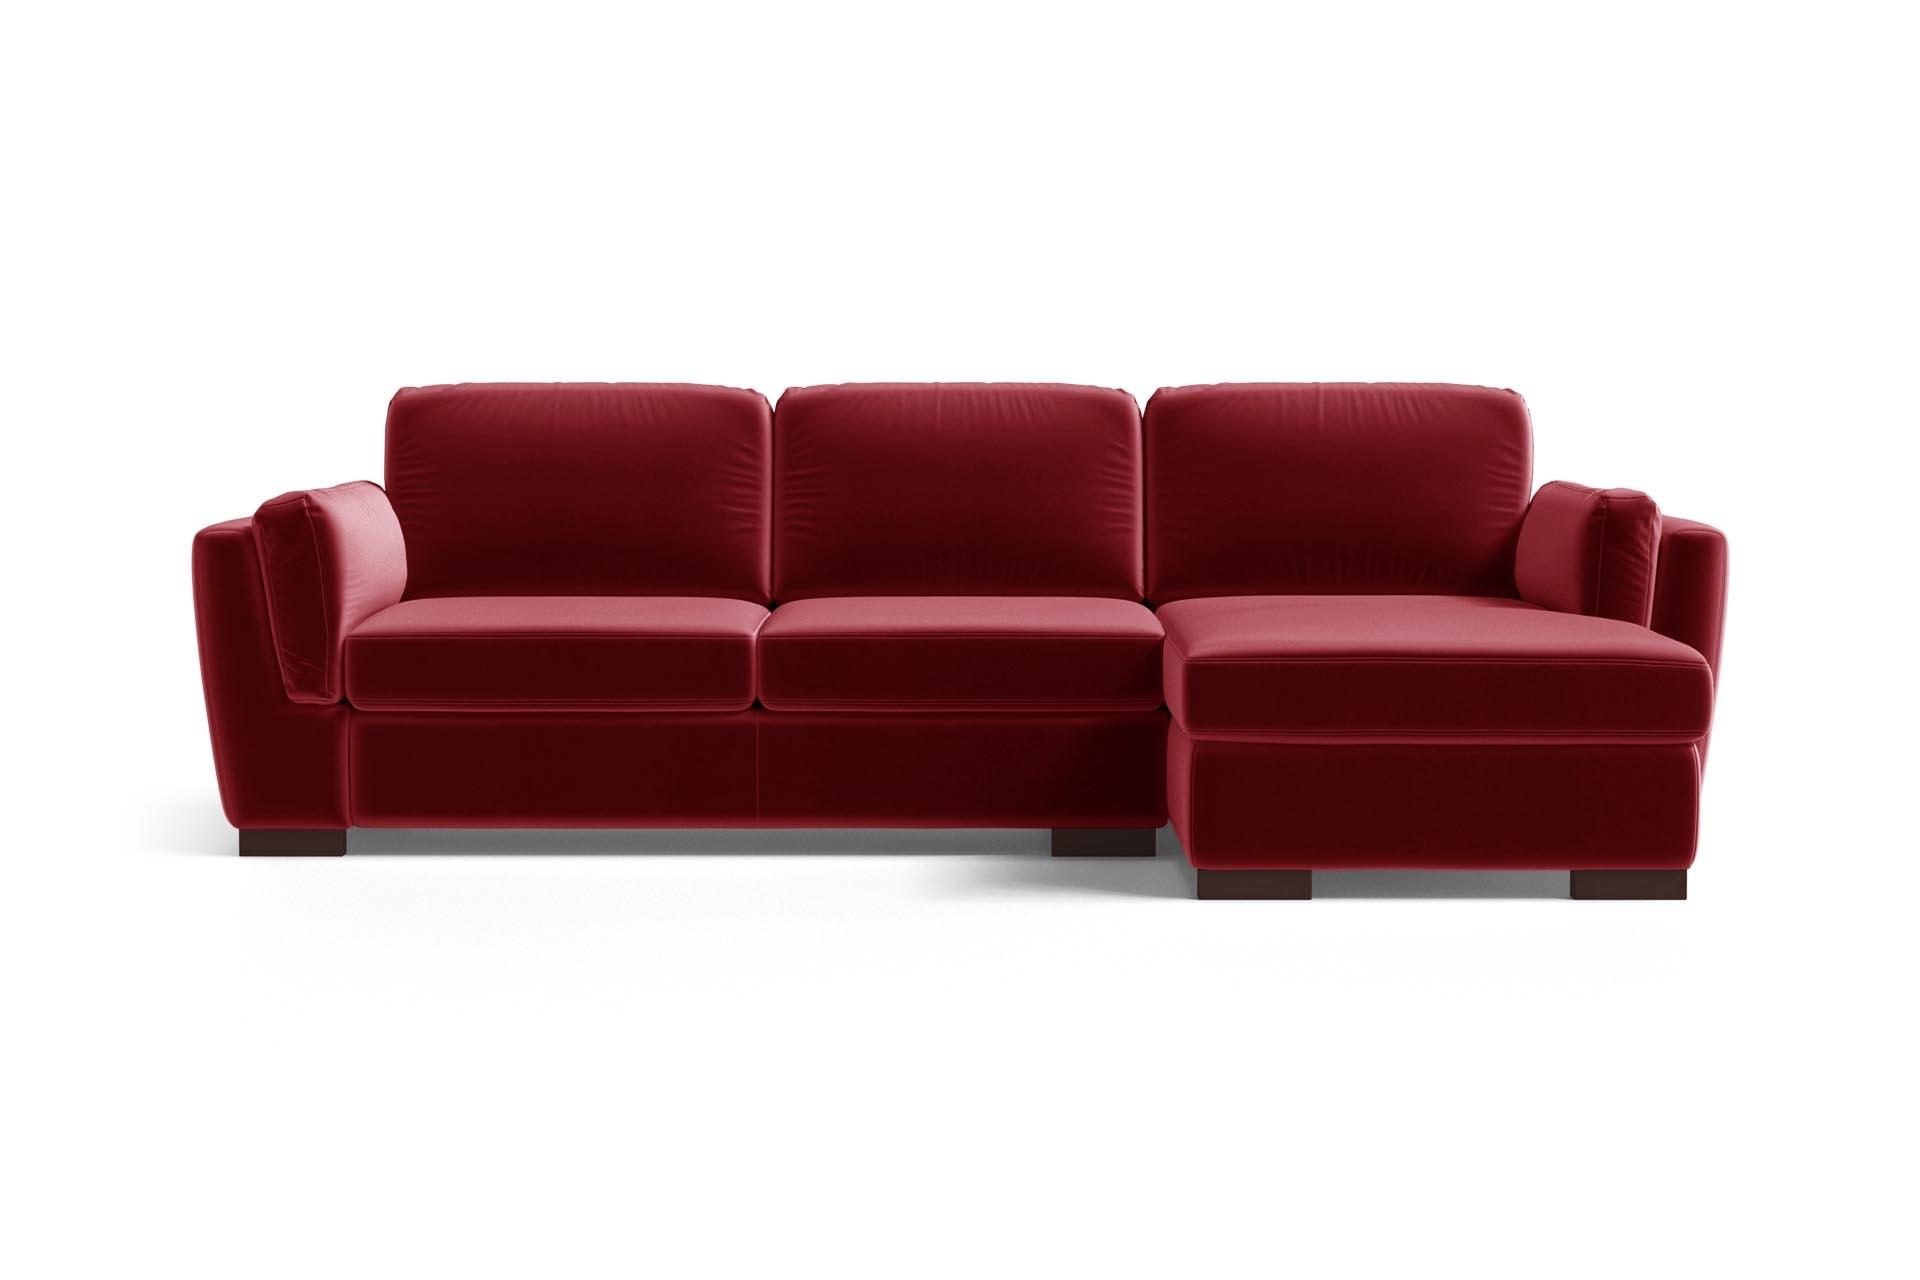 Canapé d'angle 4 places Rouge Velours Luxe Design